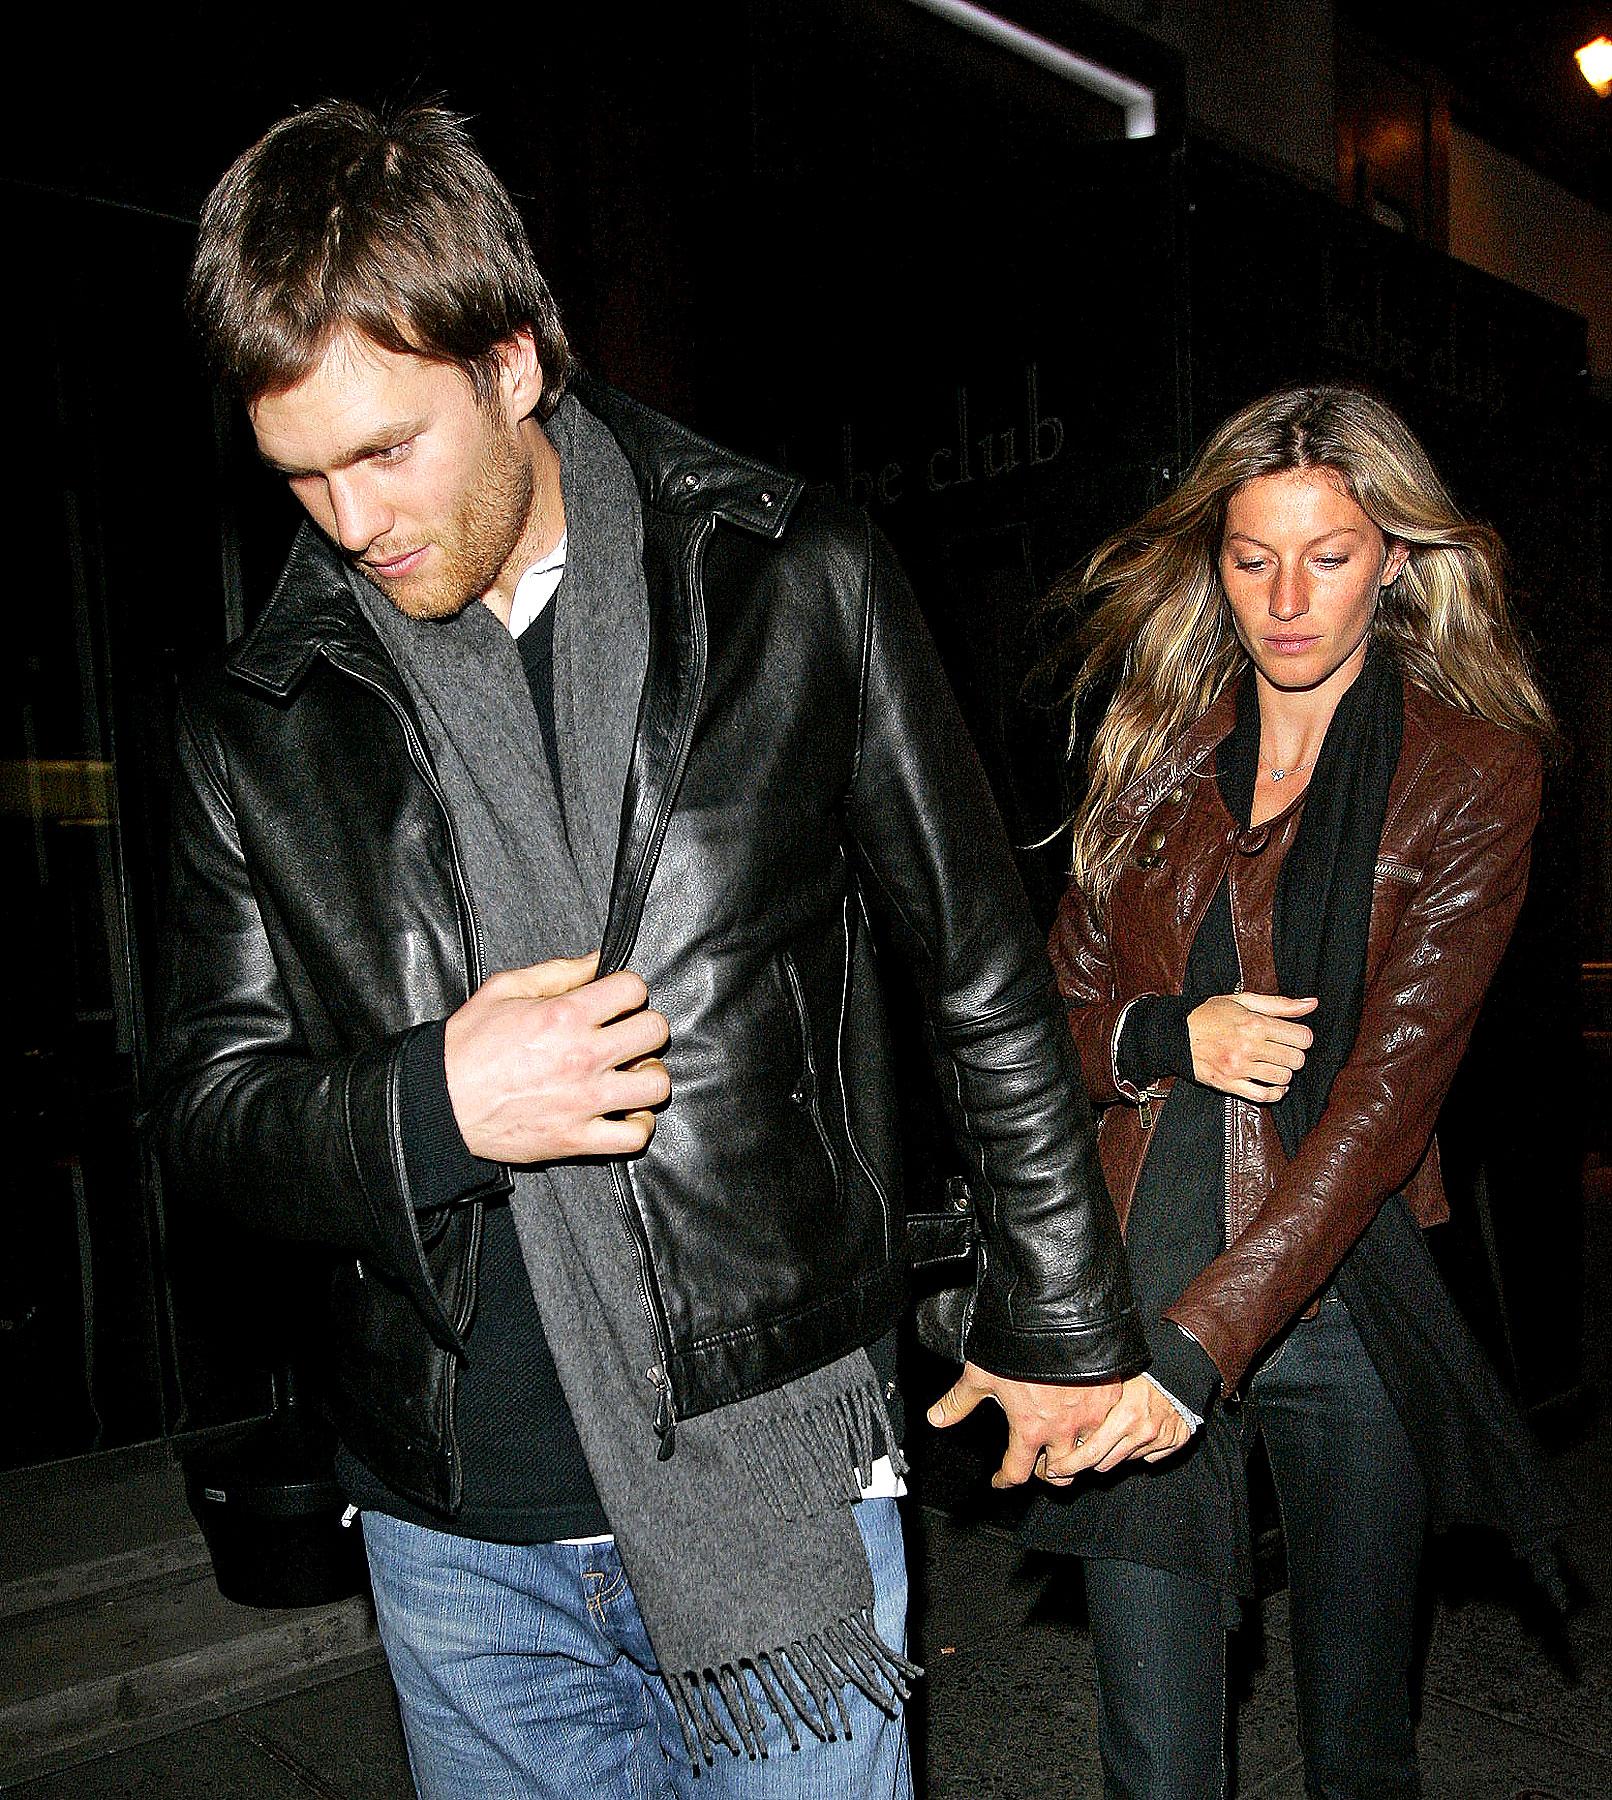 Tom Brady and Gisele Bundchen's Wedding-Day Switcheroo